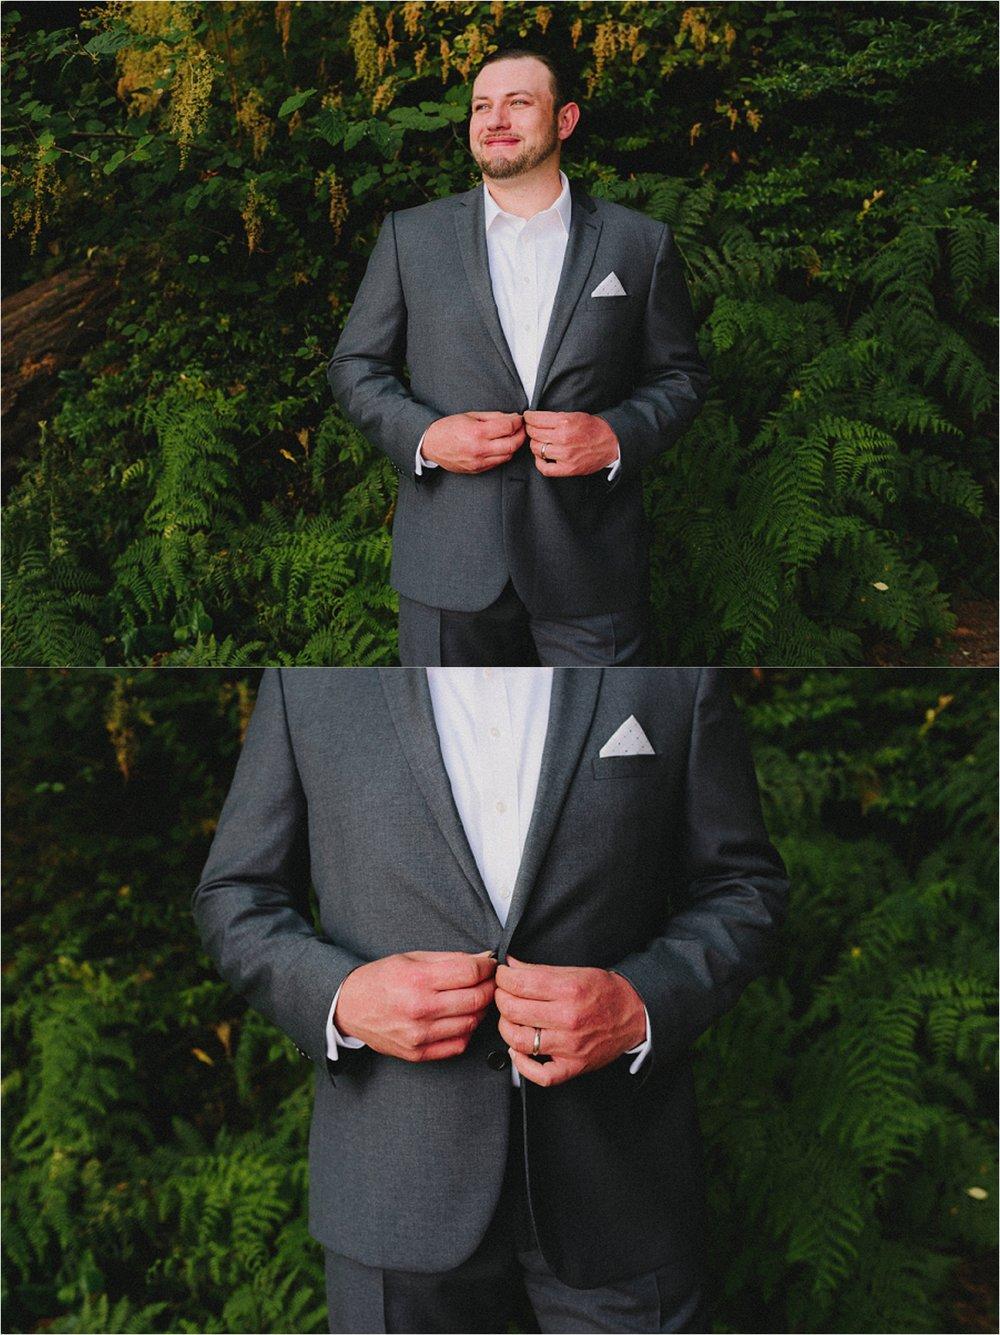 owen-beach-priest-point-park-tacoma-washington-elopement-jannicka-mayte-anchorage-alaska-wedding-elopement-photographer (21).jpg